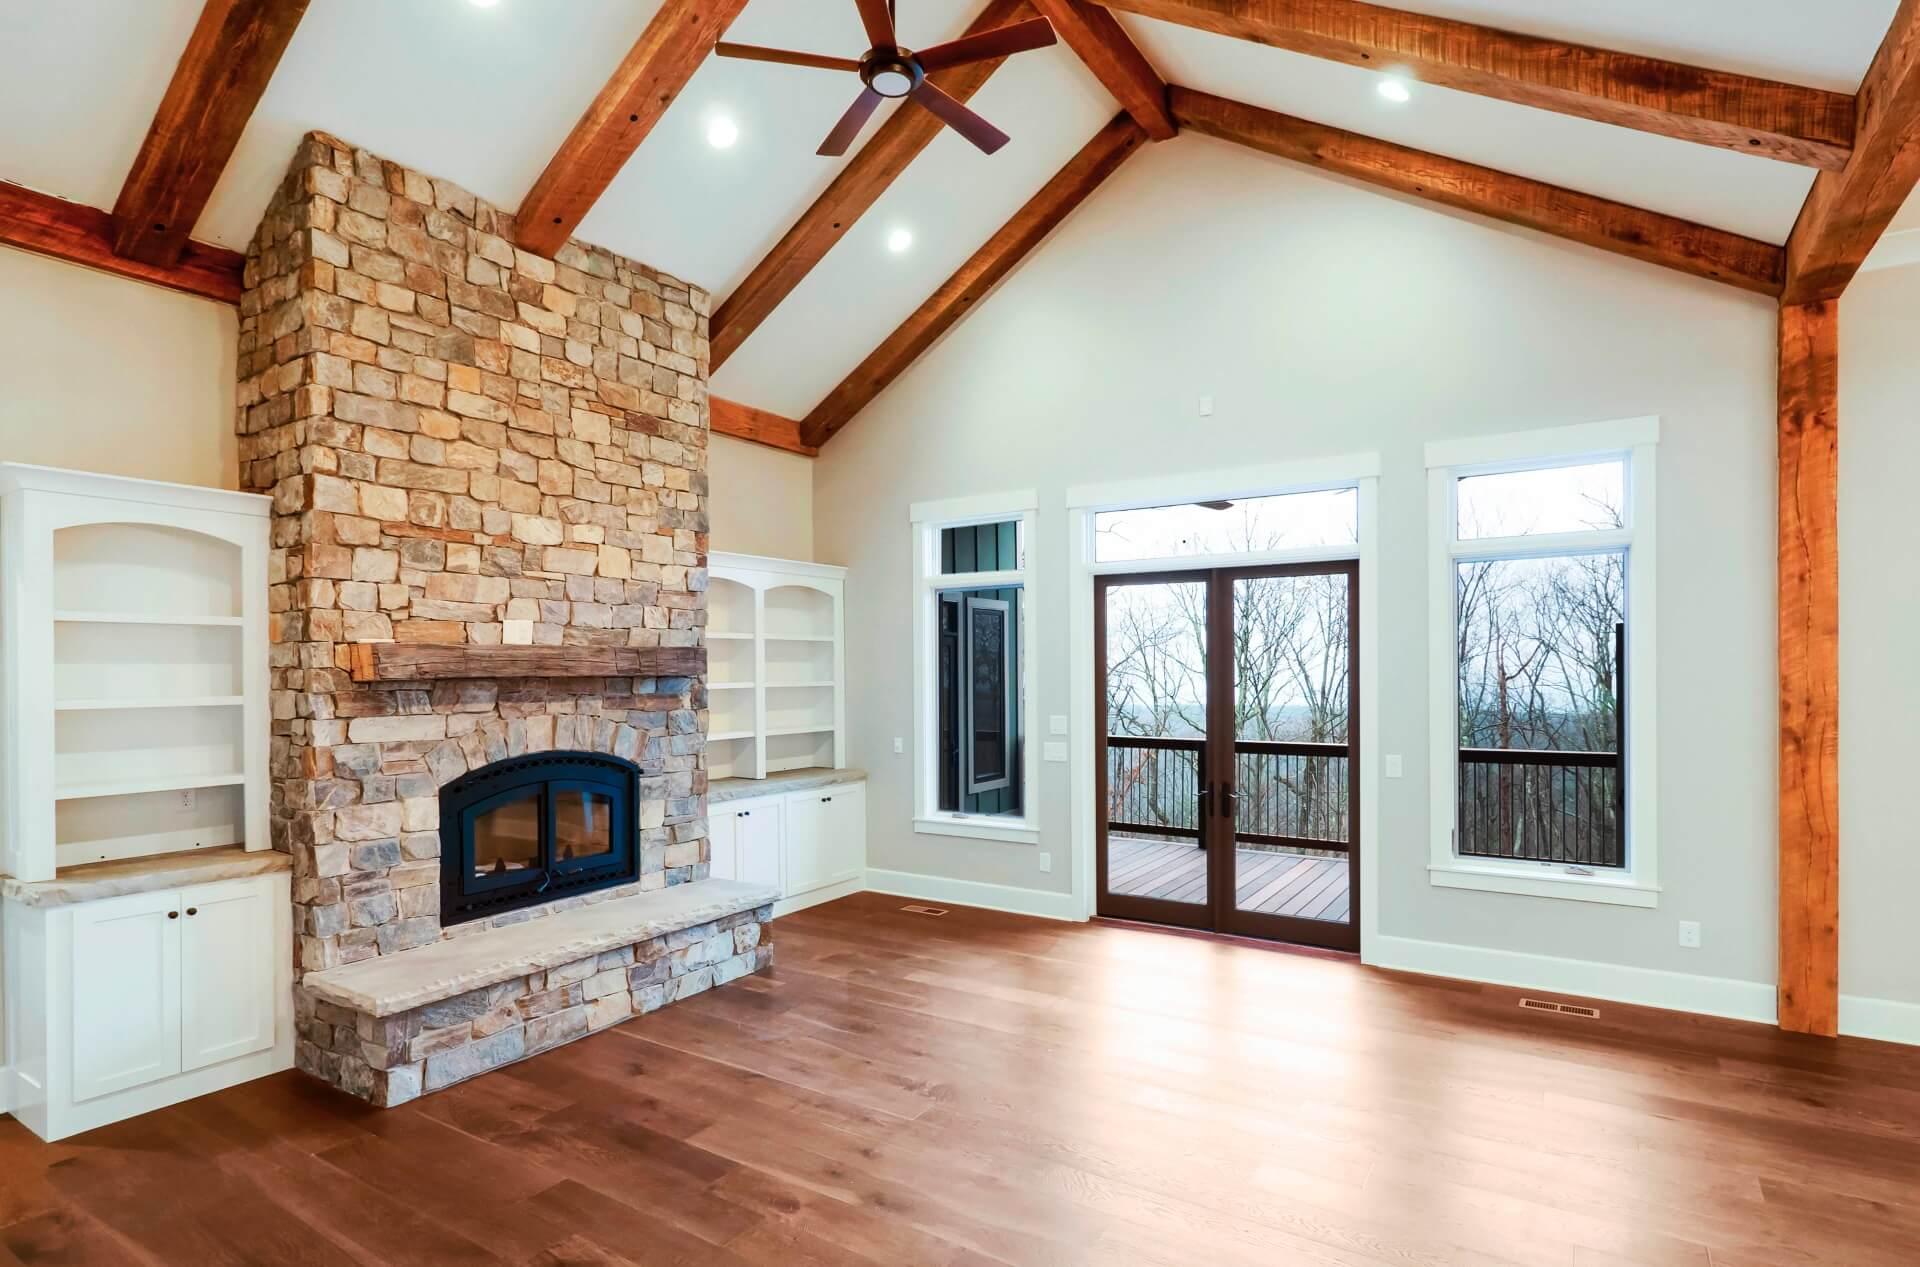 living-room-custom-oak-beams-exposed-rustic-granite-fireplace-1